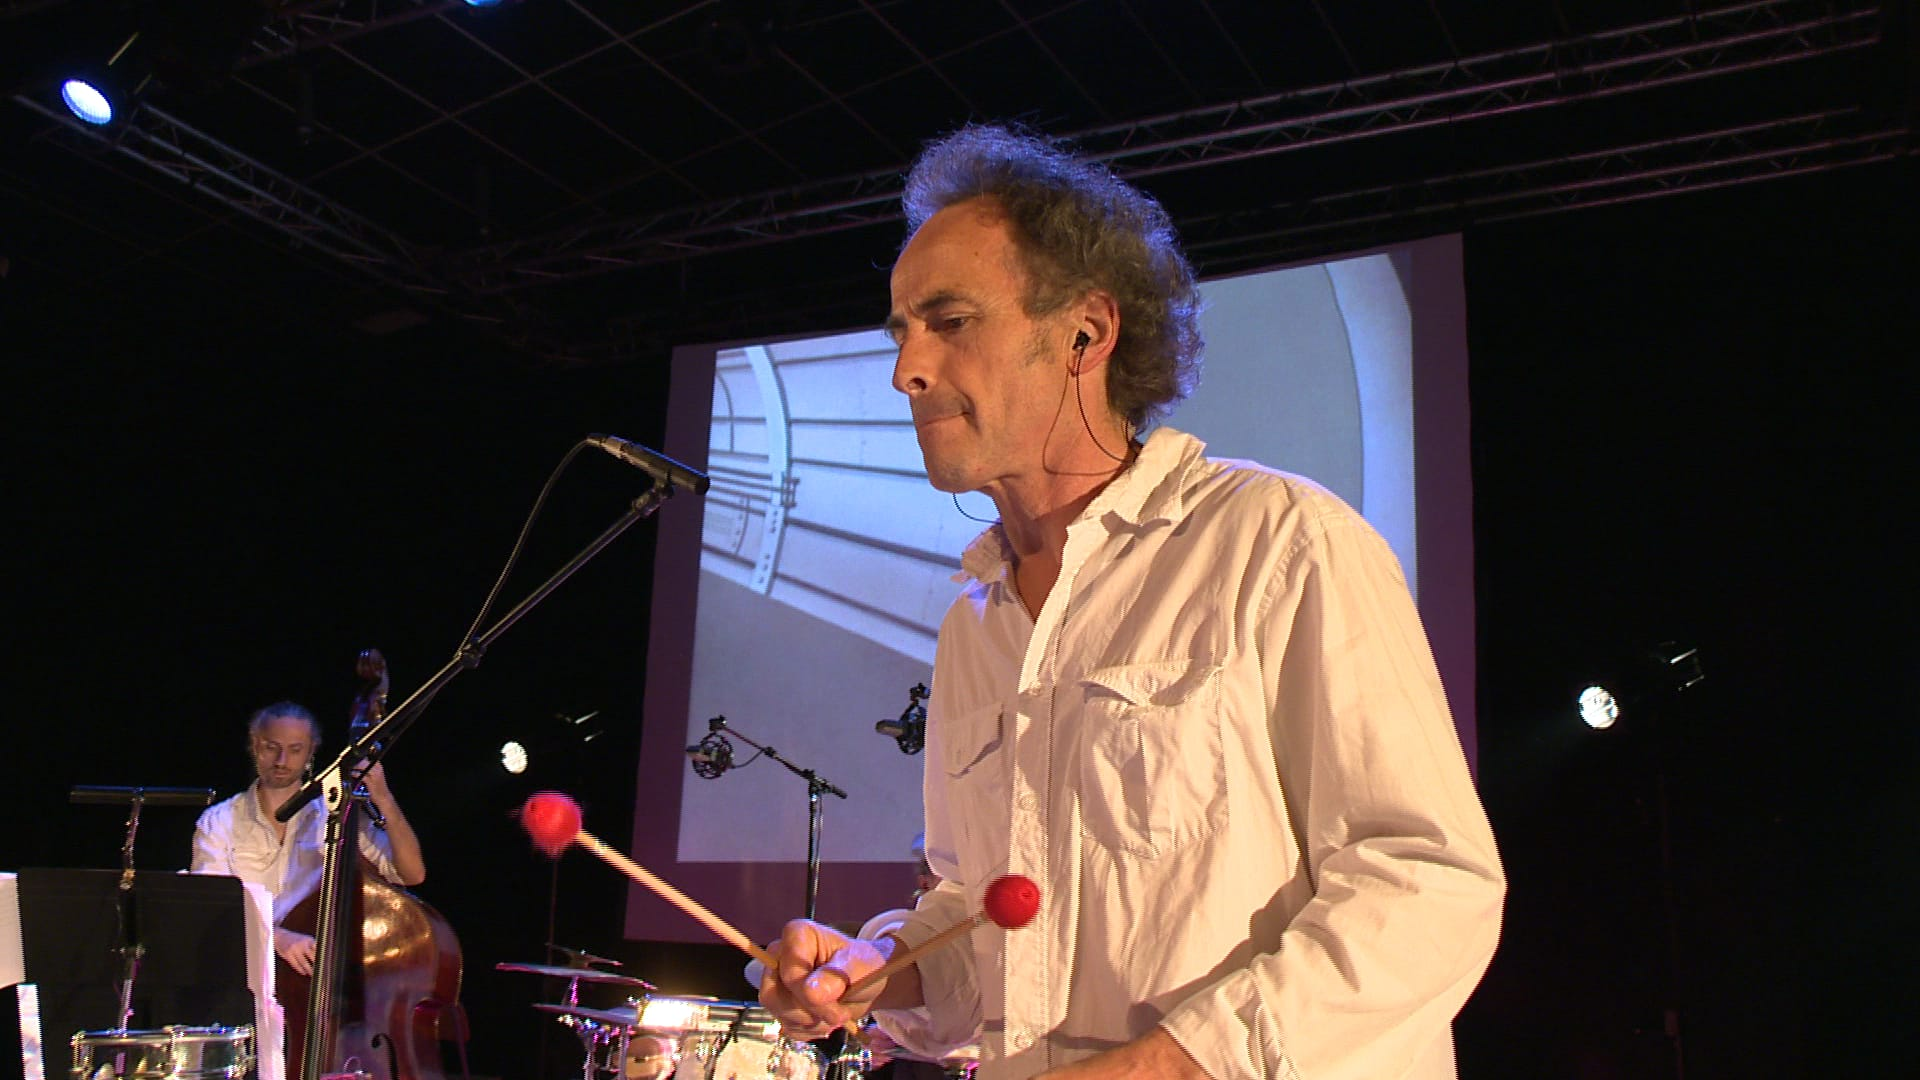 europajazz 2012 3